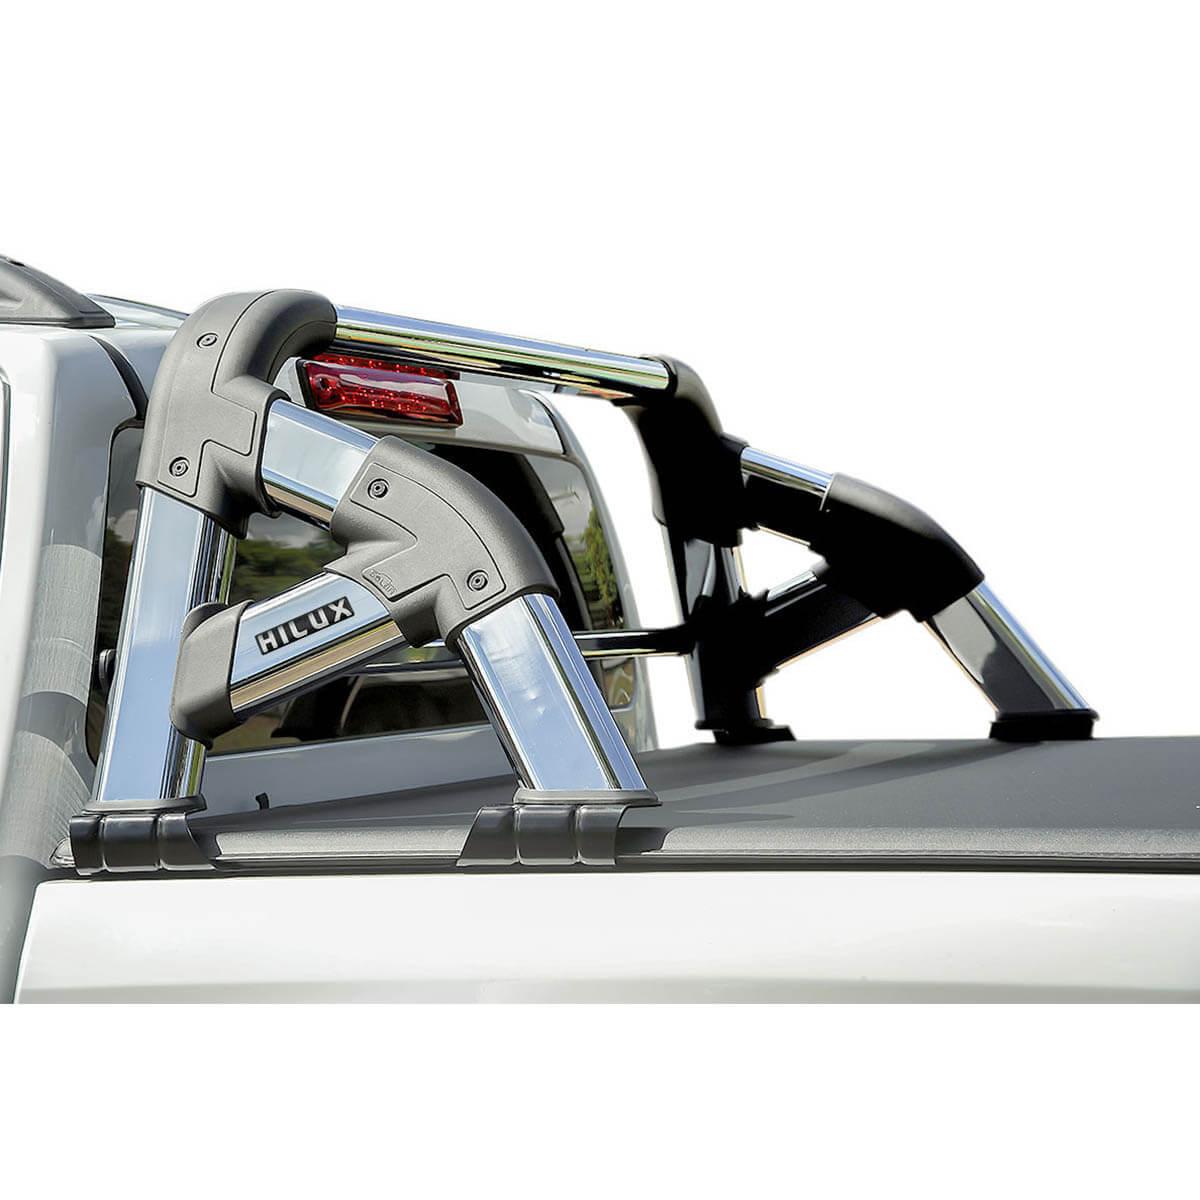 Santo antônio cromado Solar Exclusive Nova Hilux 2016 2017 com barra de vidro cromada